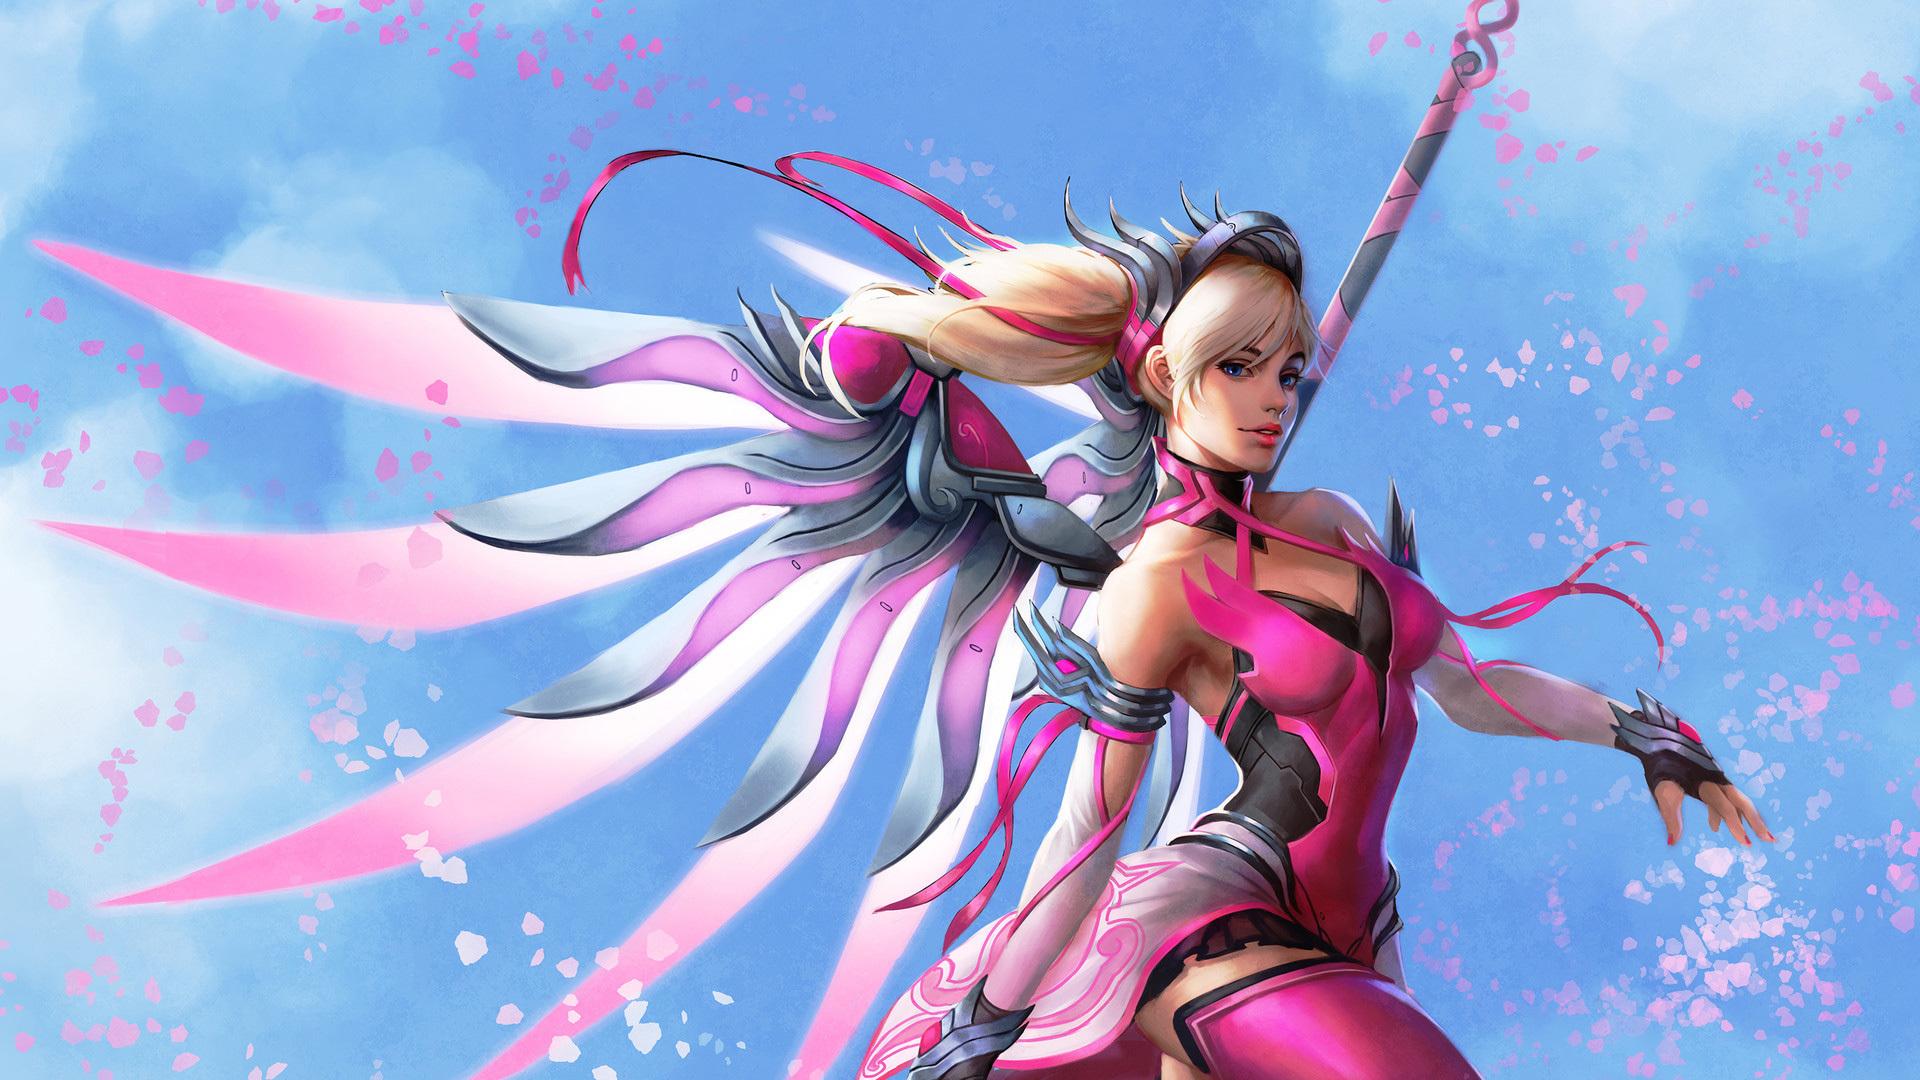 1920x1080 Pink Mercy Overwatch Wings Fantasy Digital Art ...